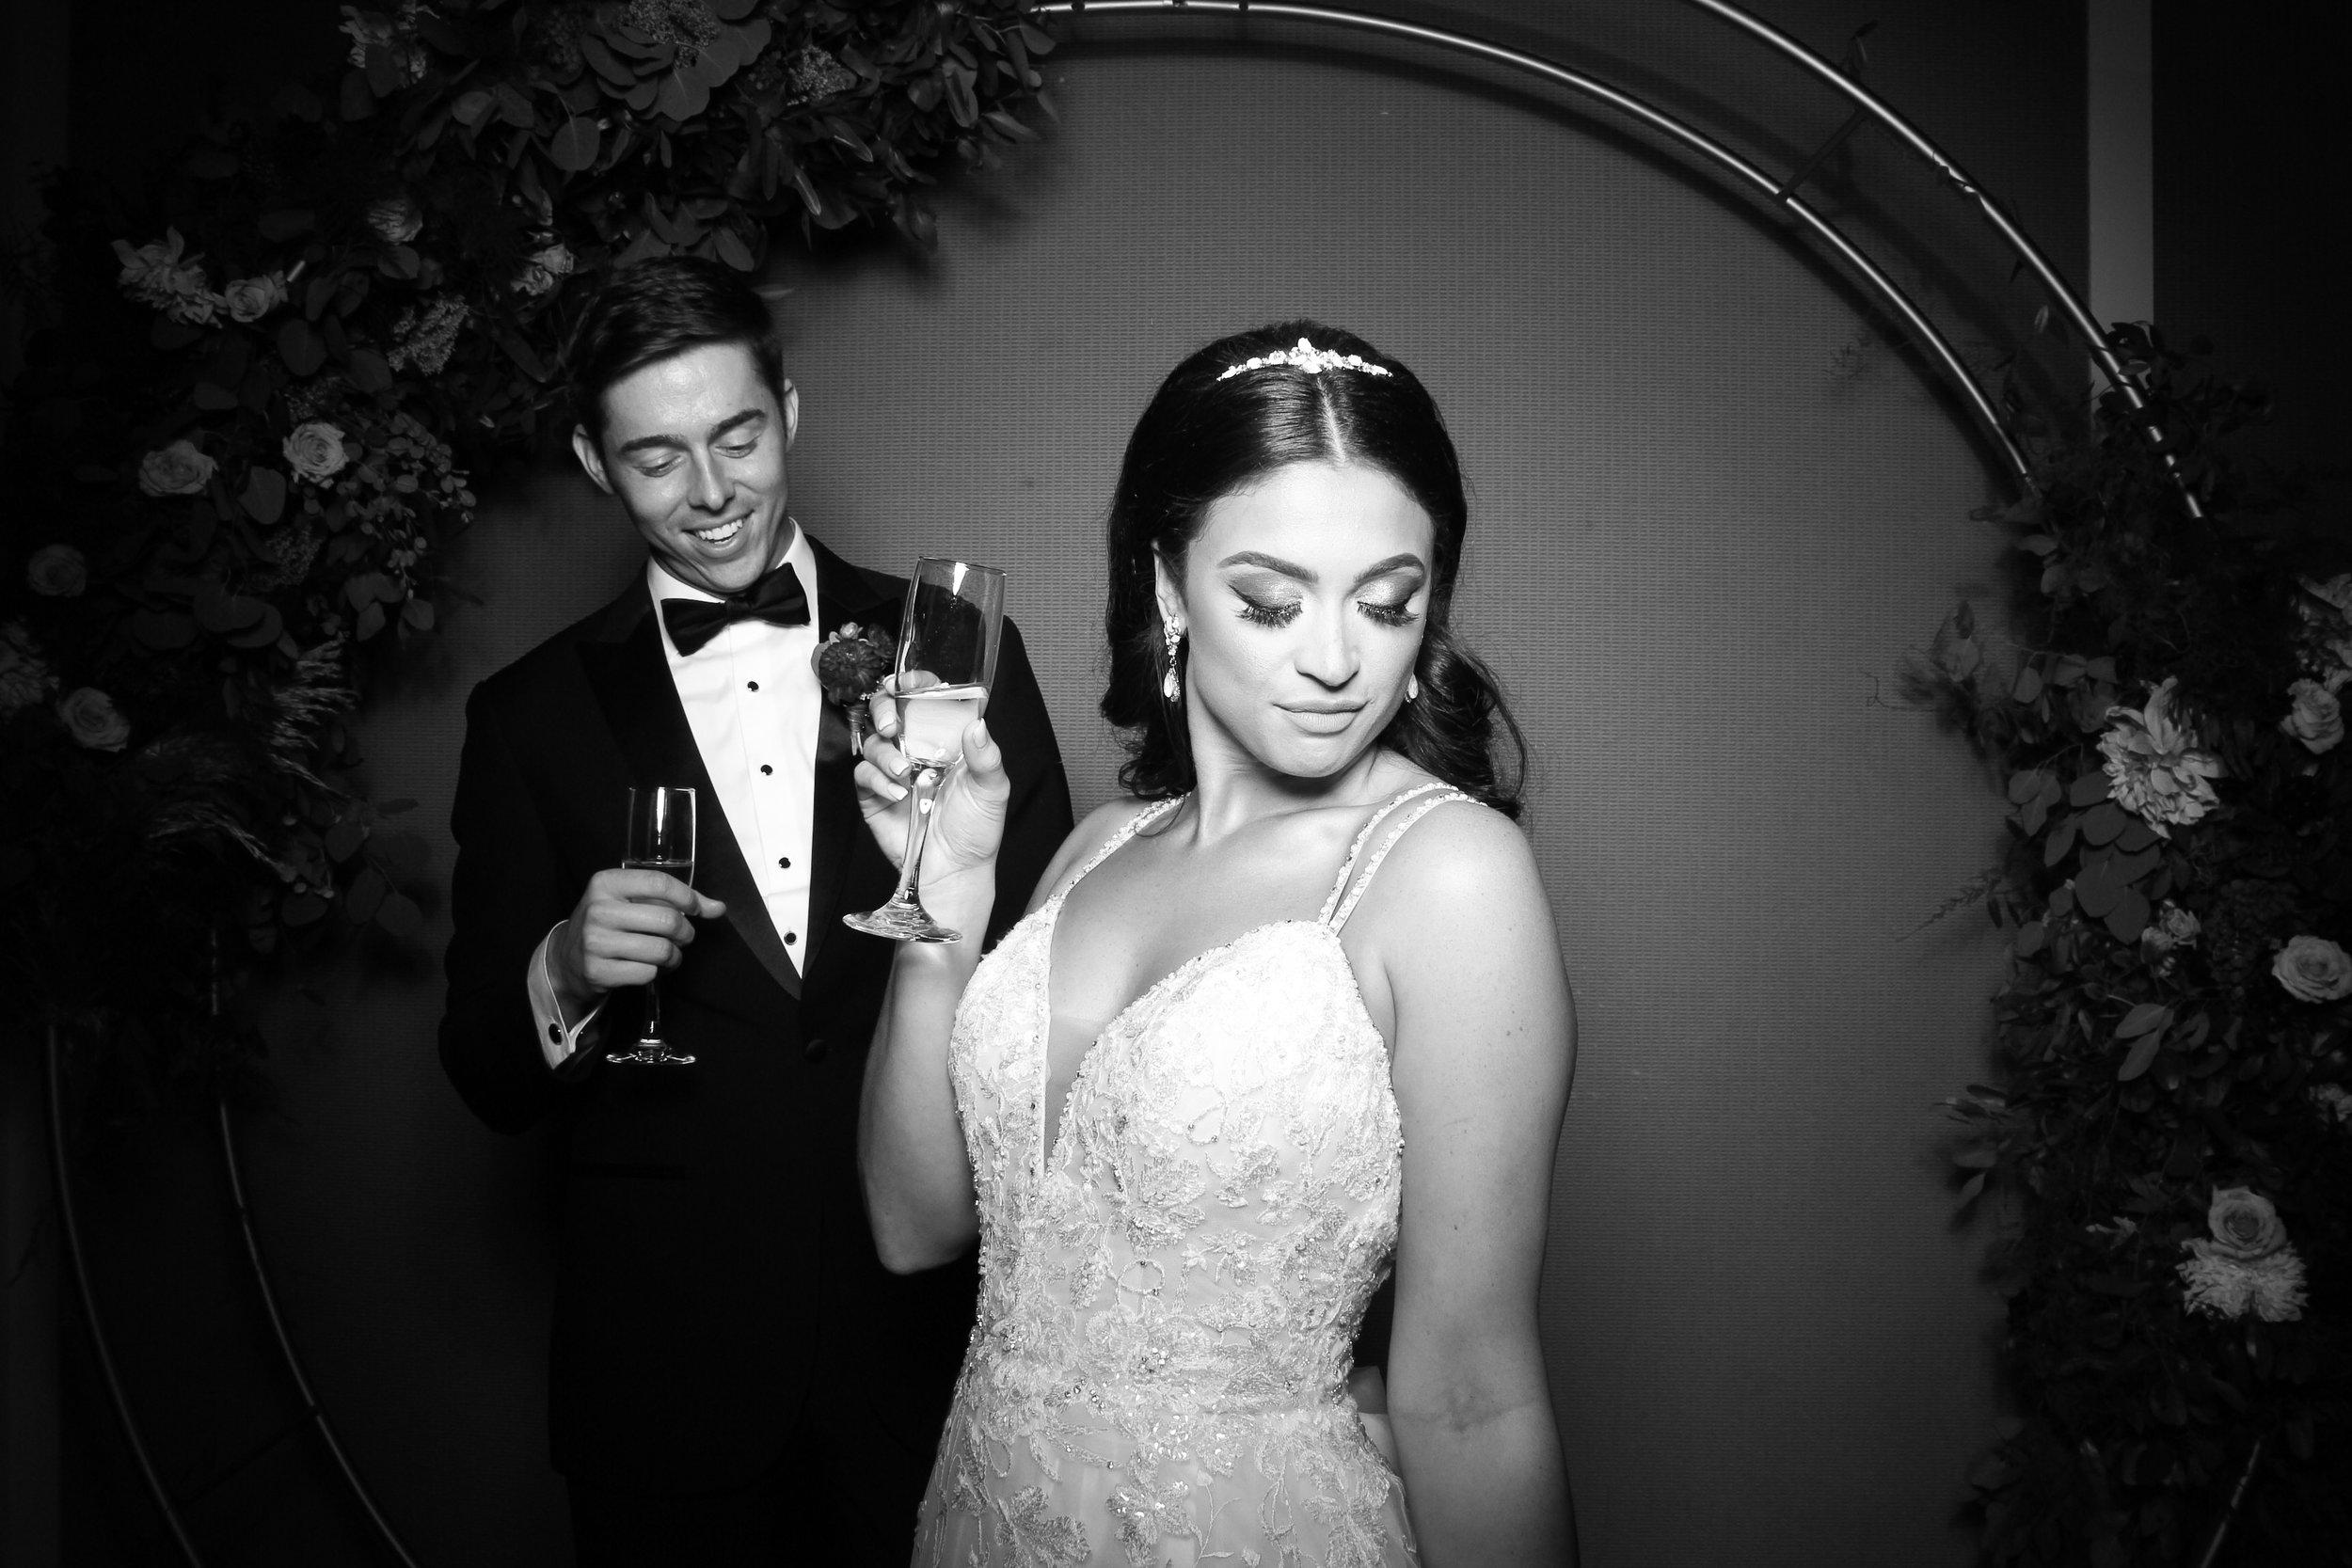 Metropolis_Ballroom_Wedding_Arlington_Heights_Photo_Booth_03.jpg